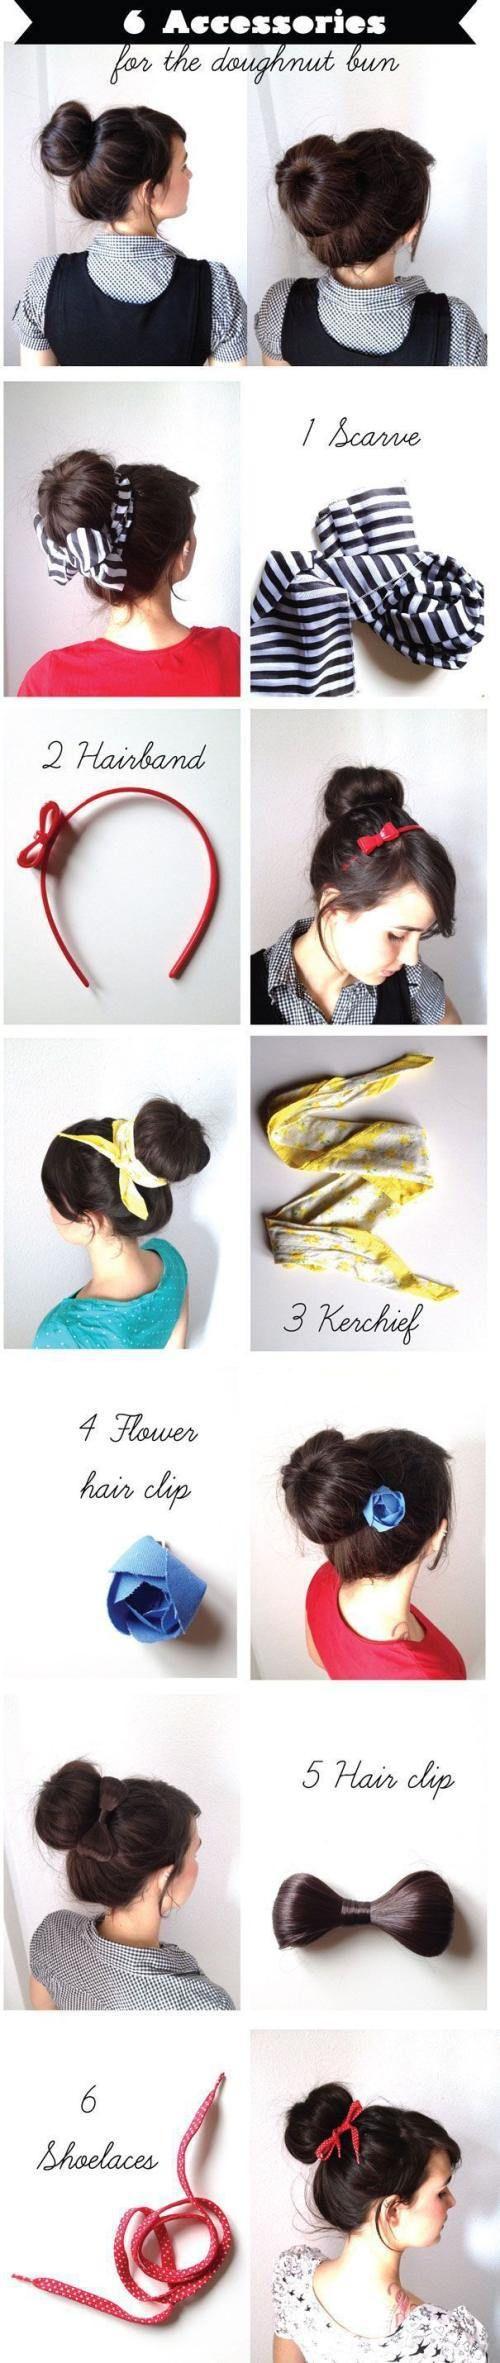 hair-styles-4